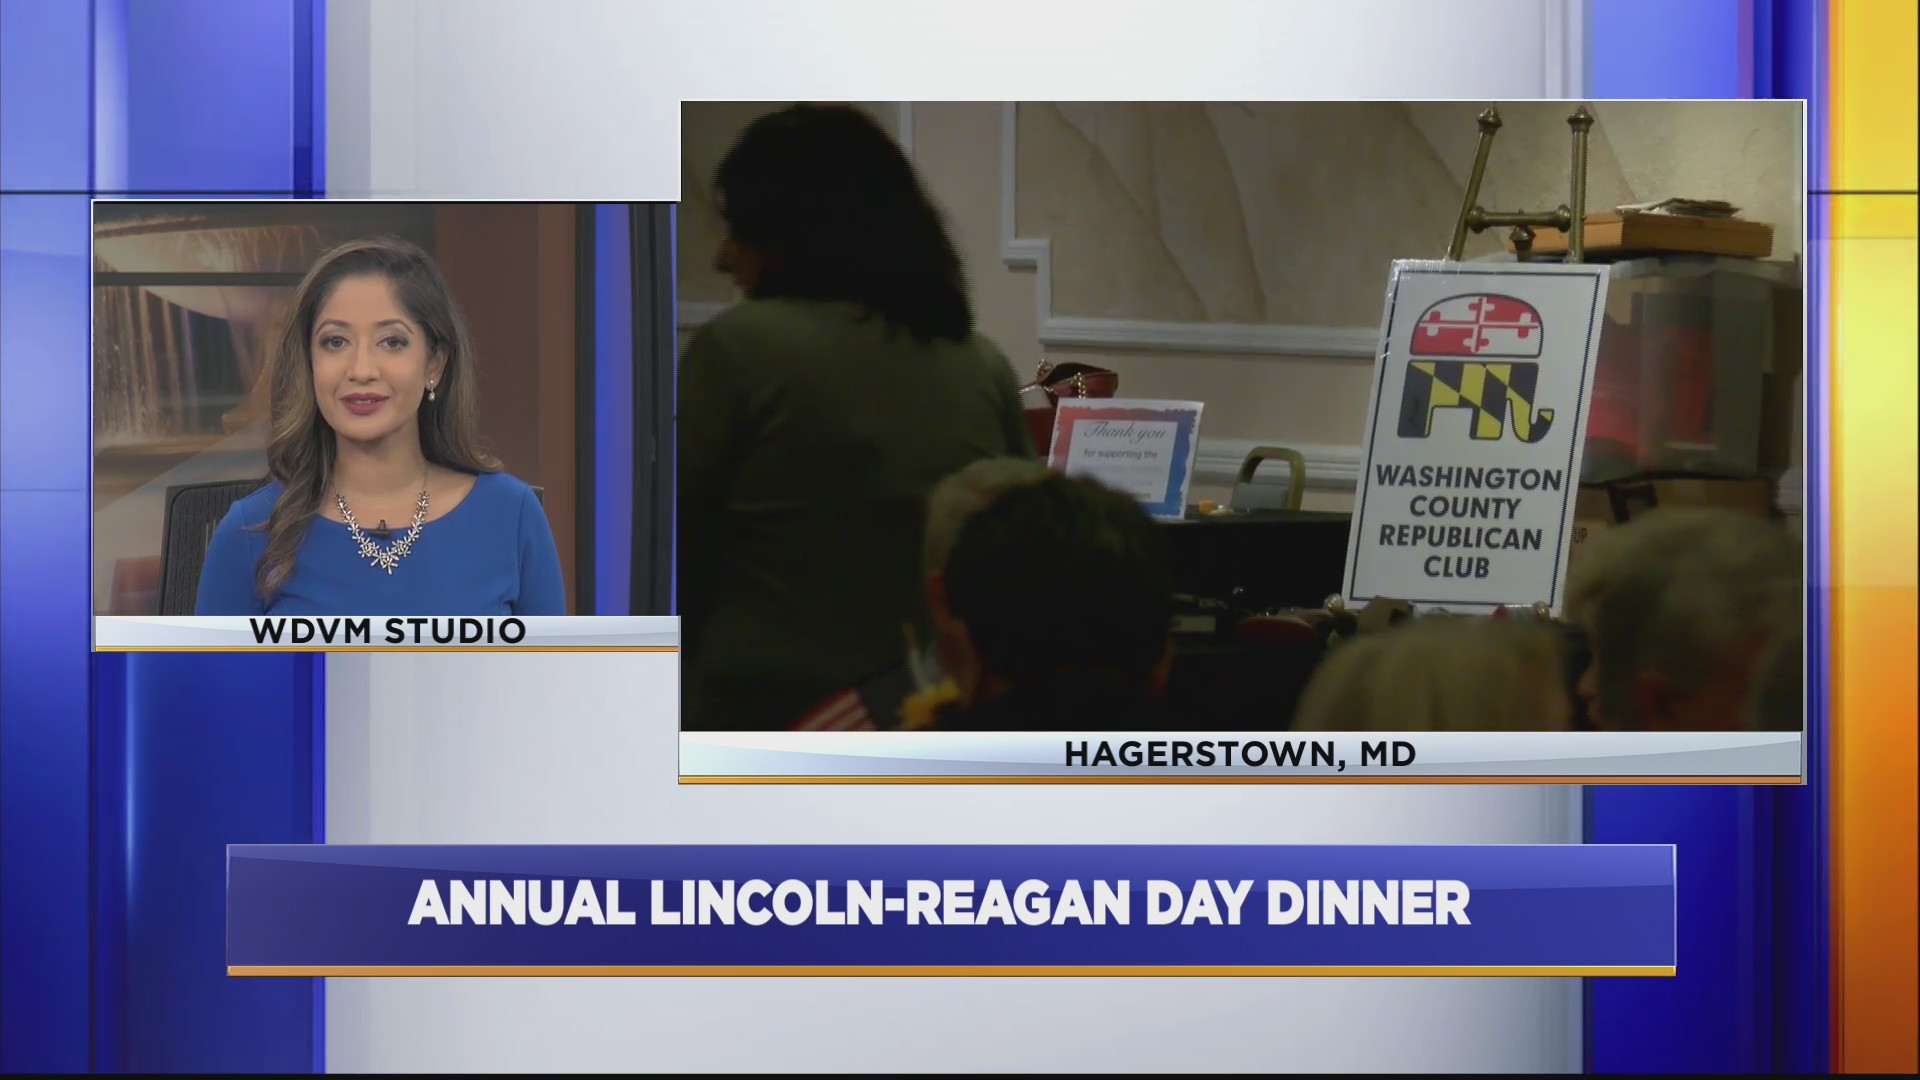 Lincol_Reagan_Day_DInner_0_20190511022037